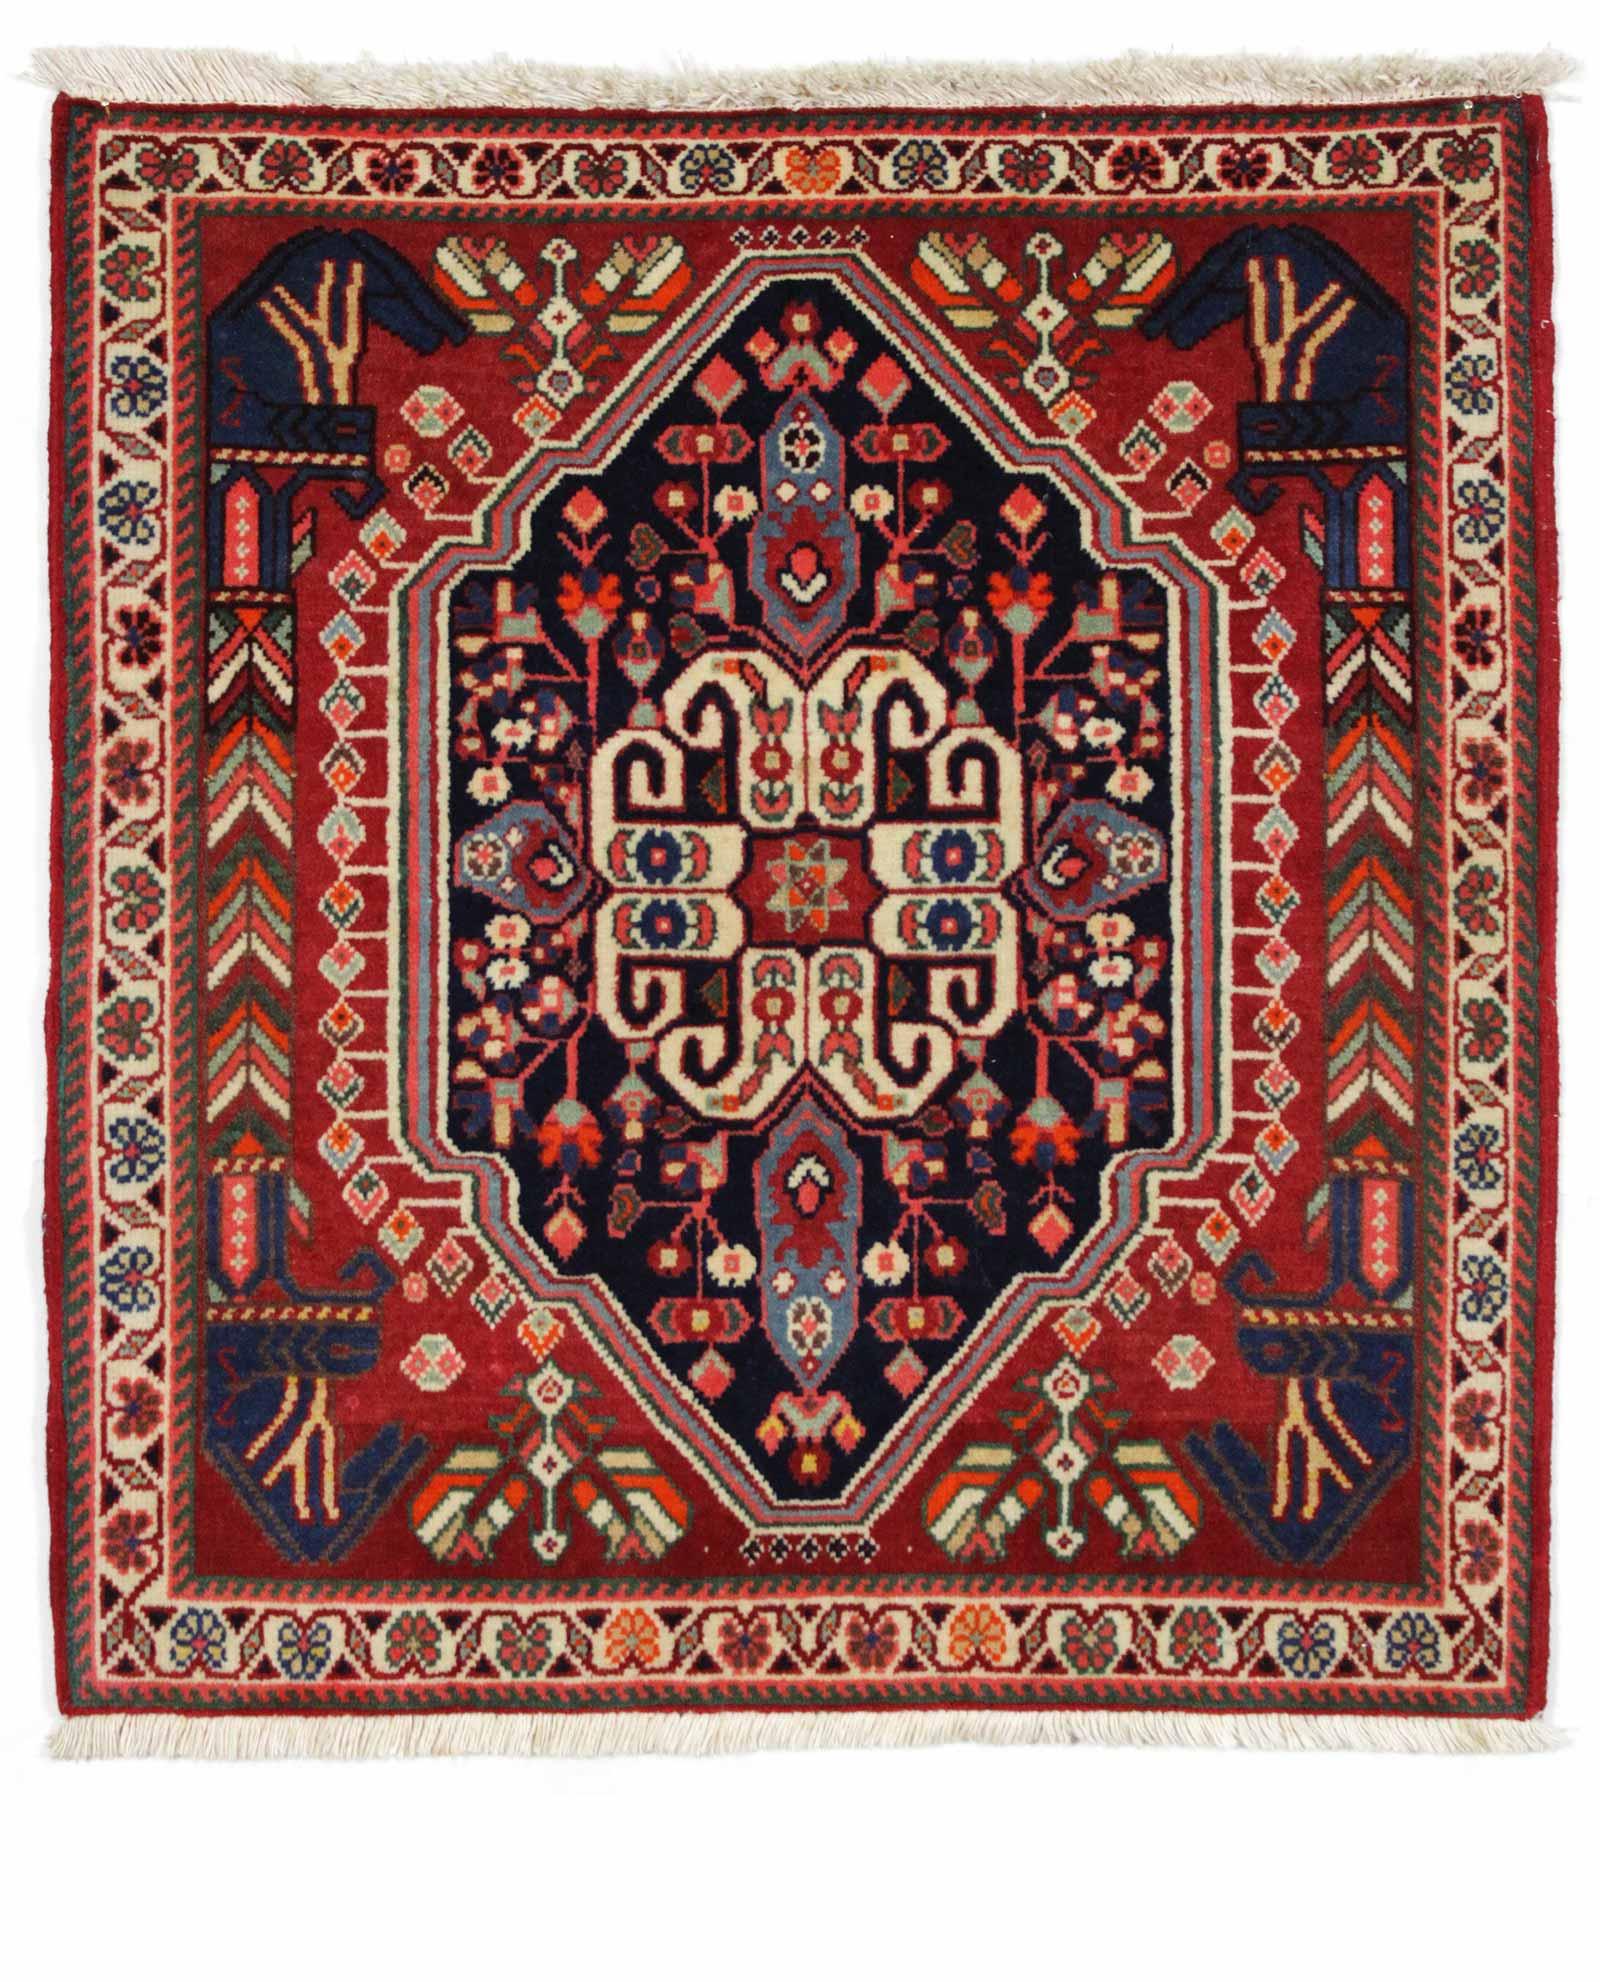 Tapis Persan Qashqai 13502 Iranian Carpet